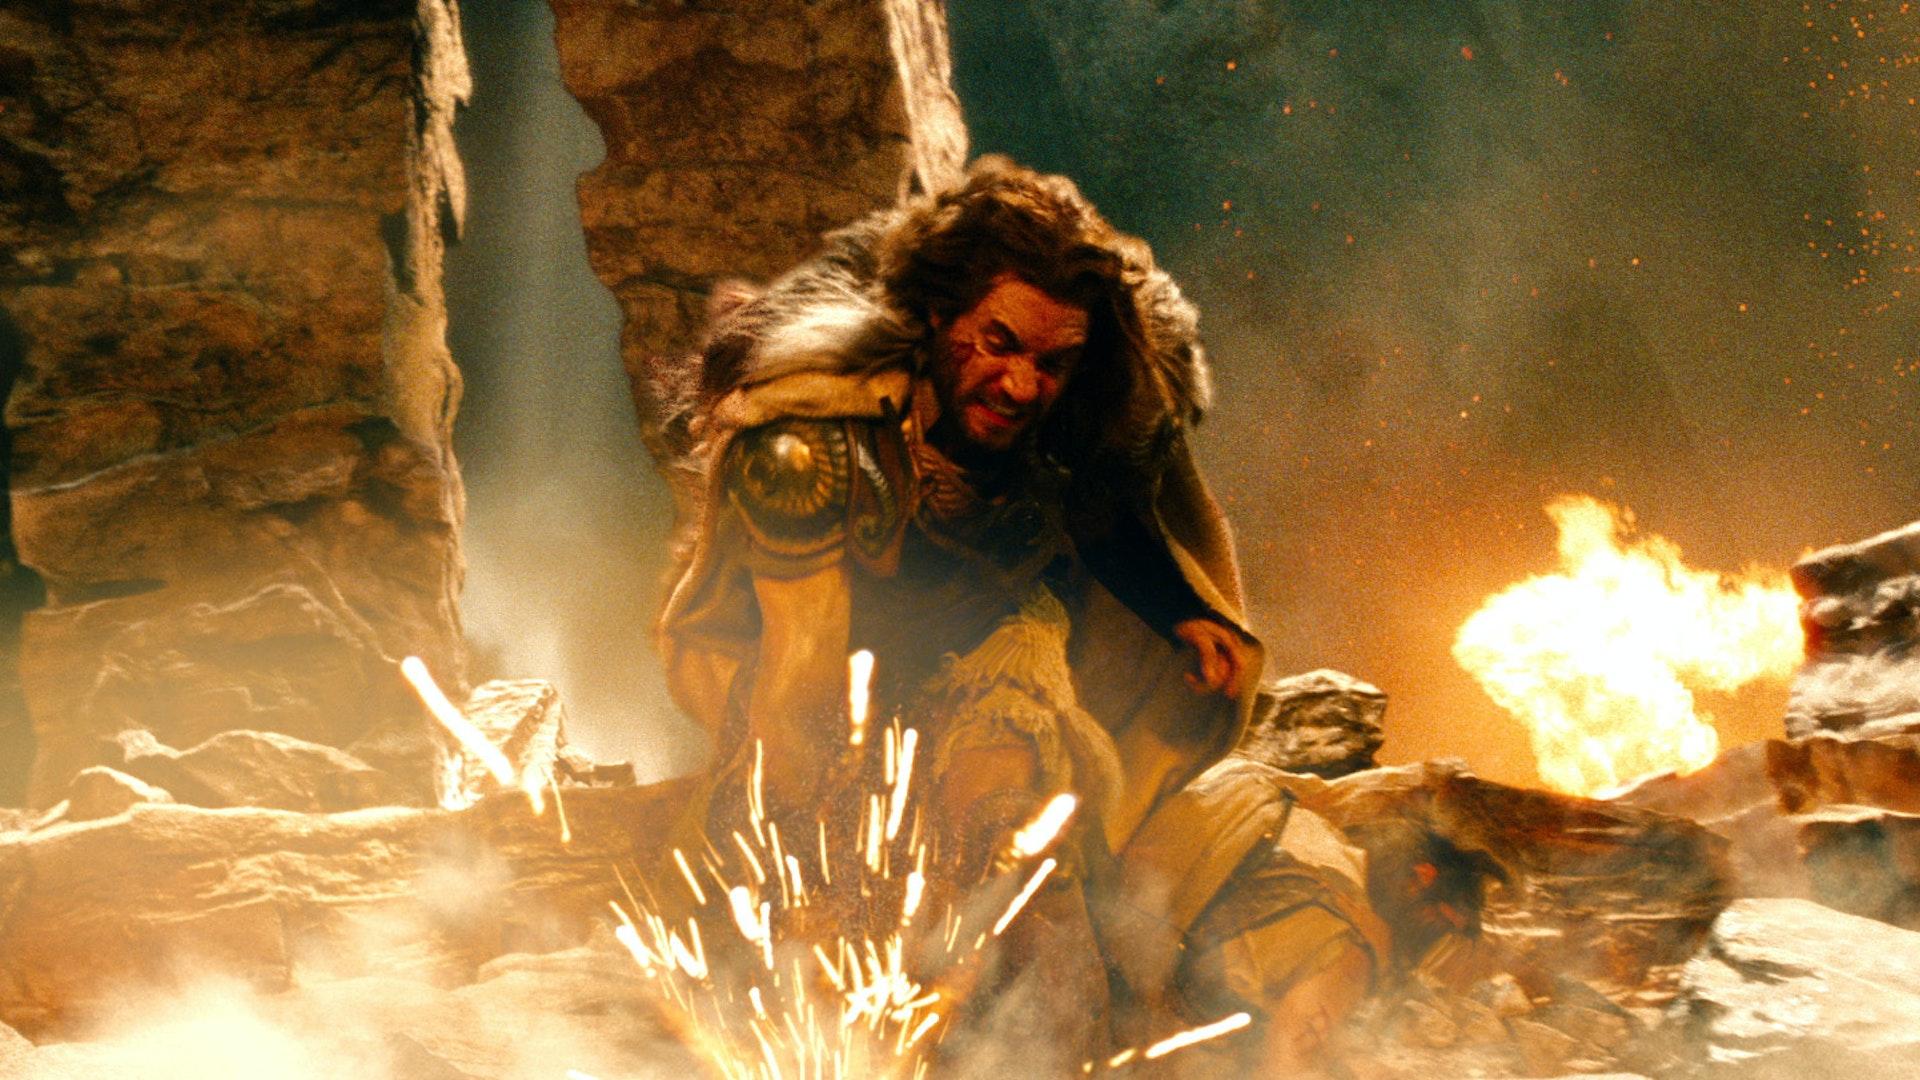 wrath-of-the-titans-movie-image-edgar-ramirez-1